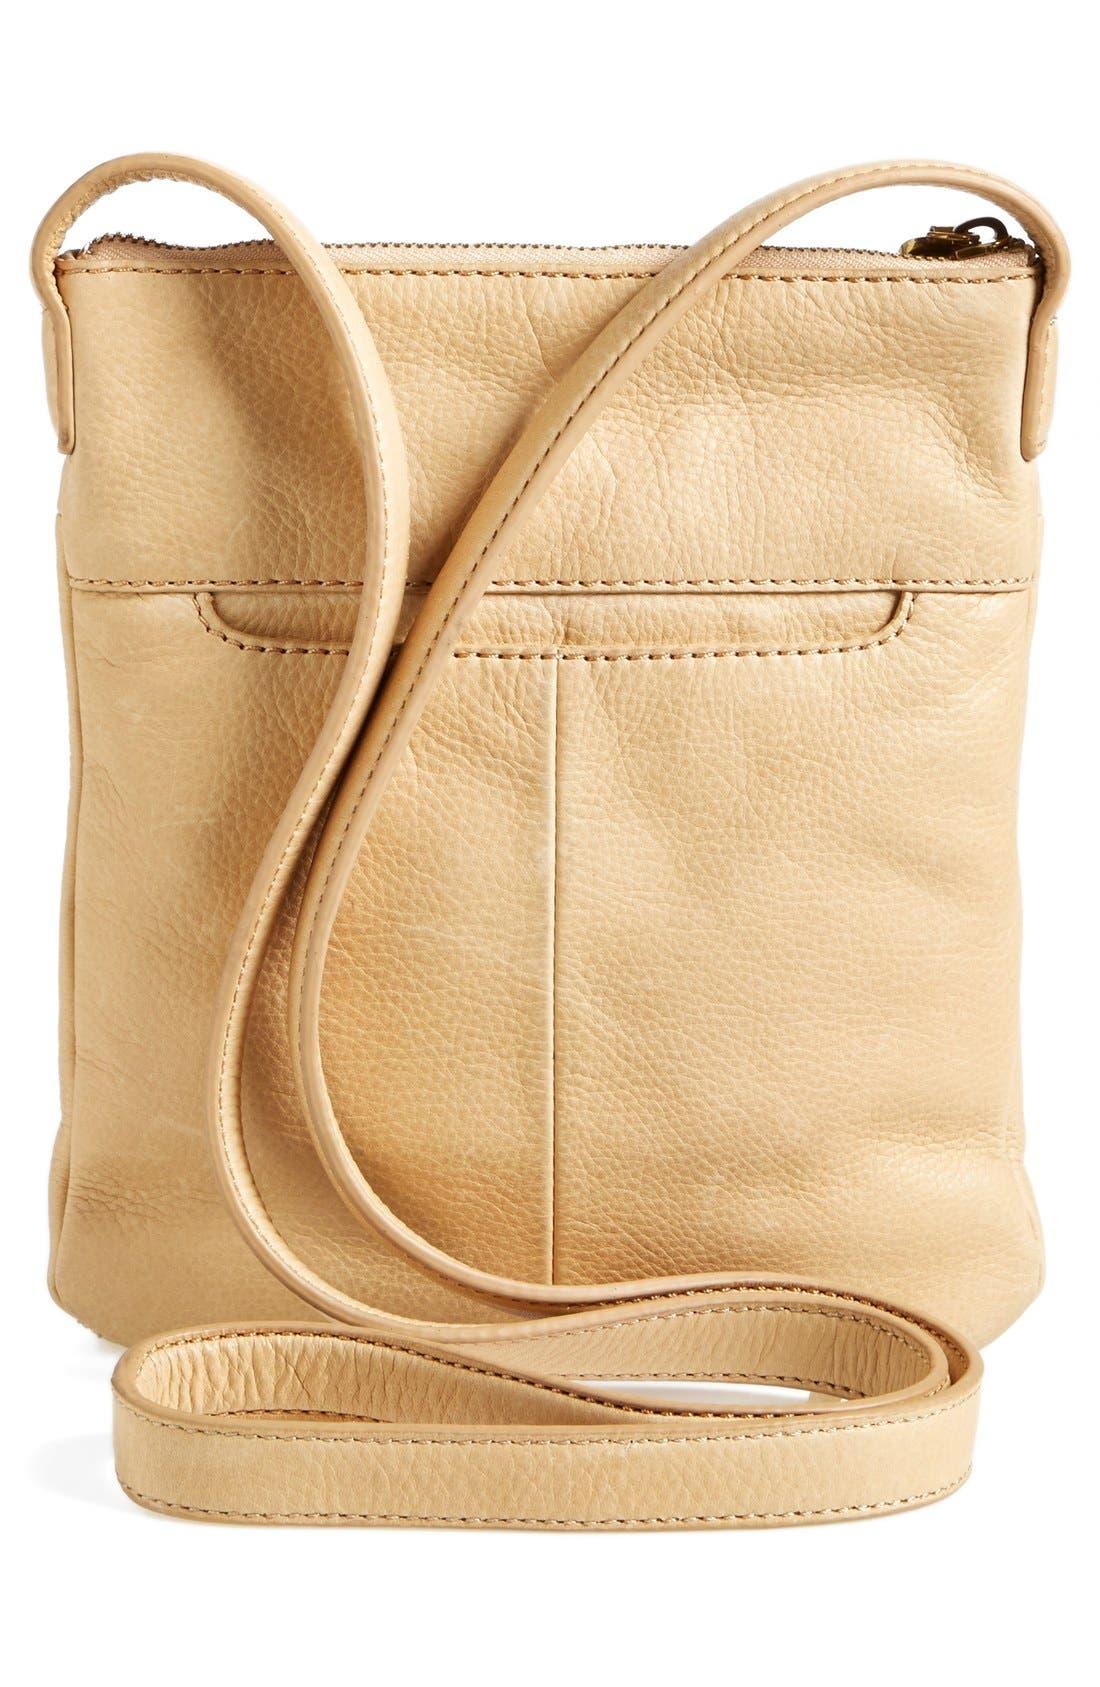 'Sarah' Leather Crossbody Bag,                             Alternate thumbnail 10, color,